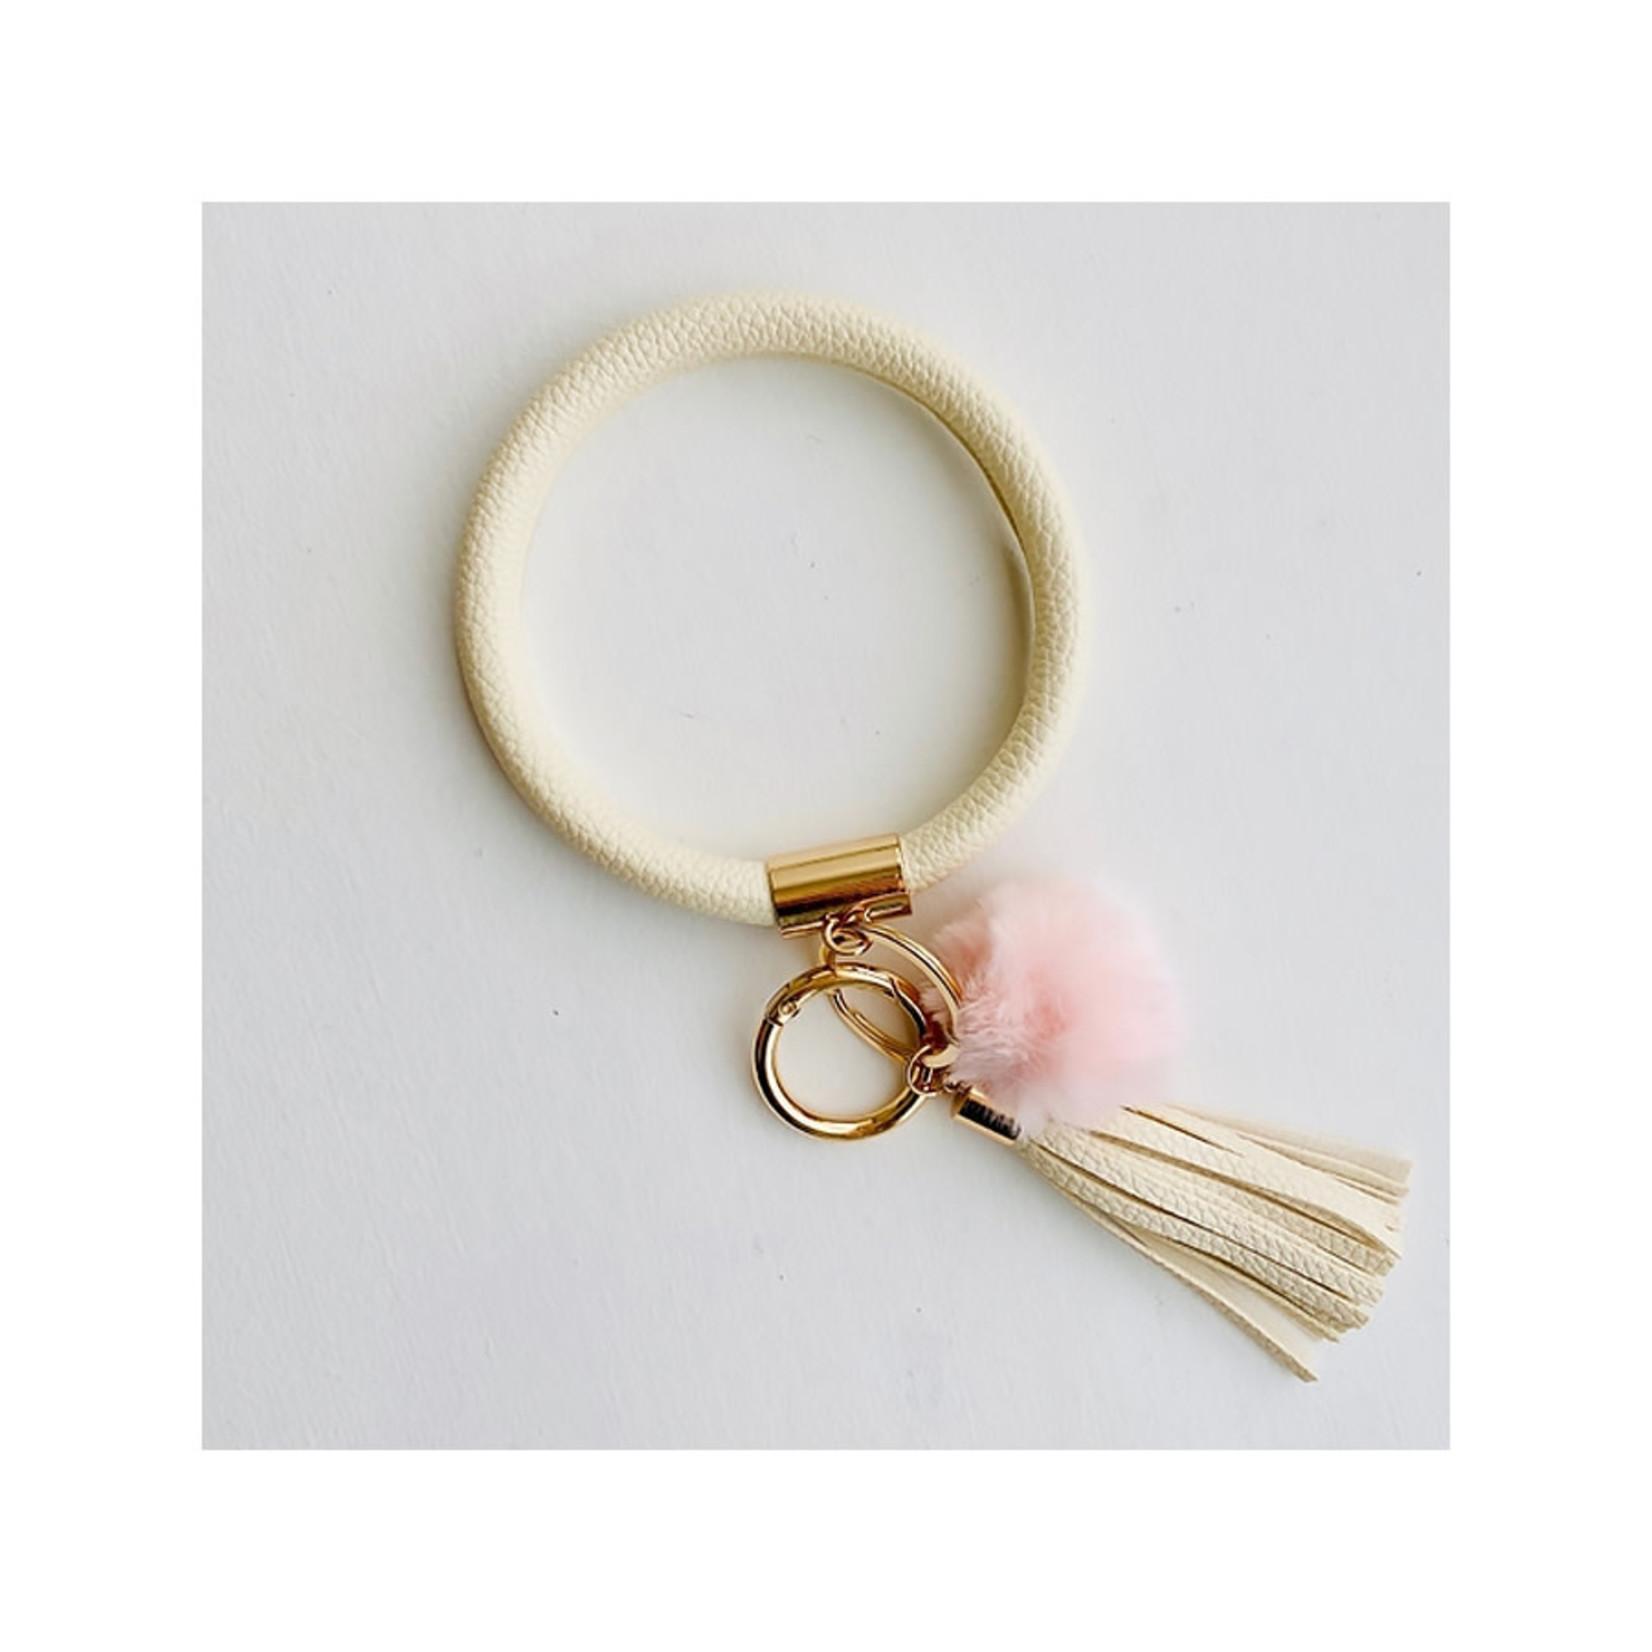 Tiny Gift Society Bangle Keychain with Pom